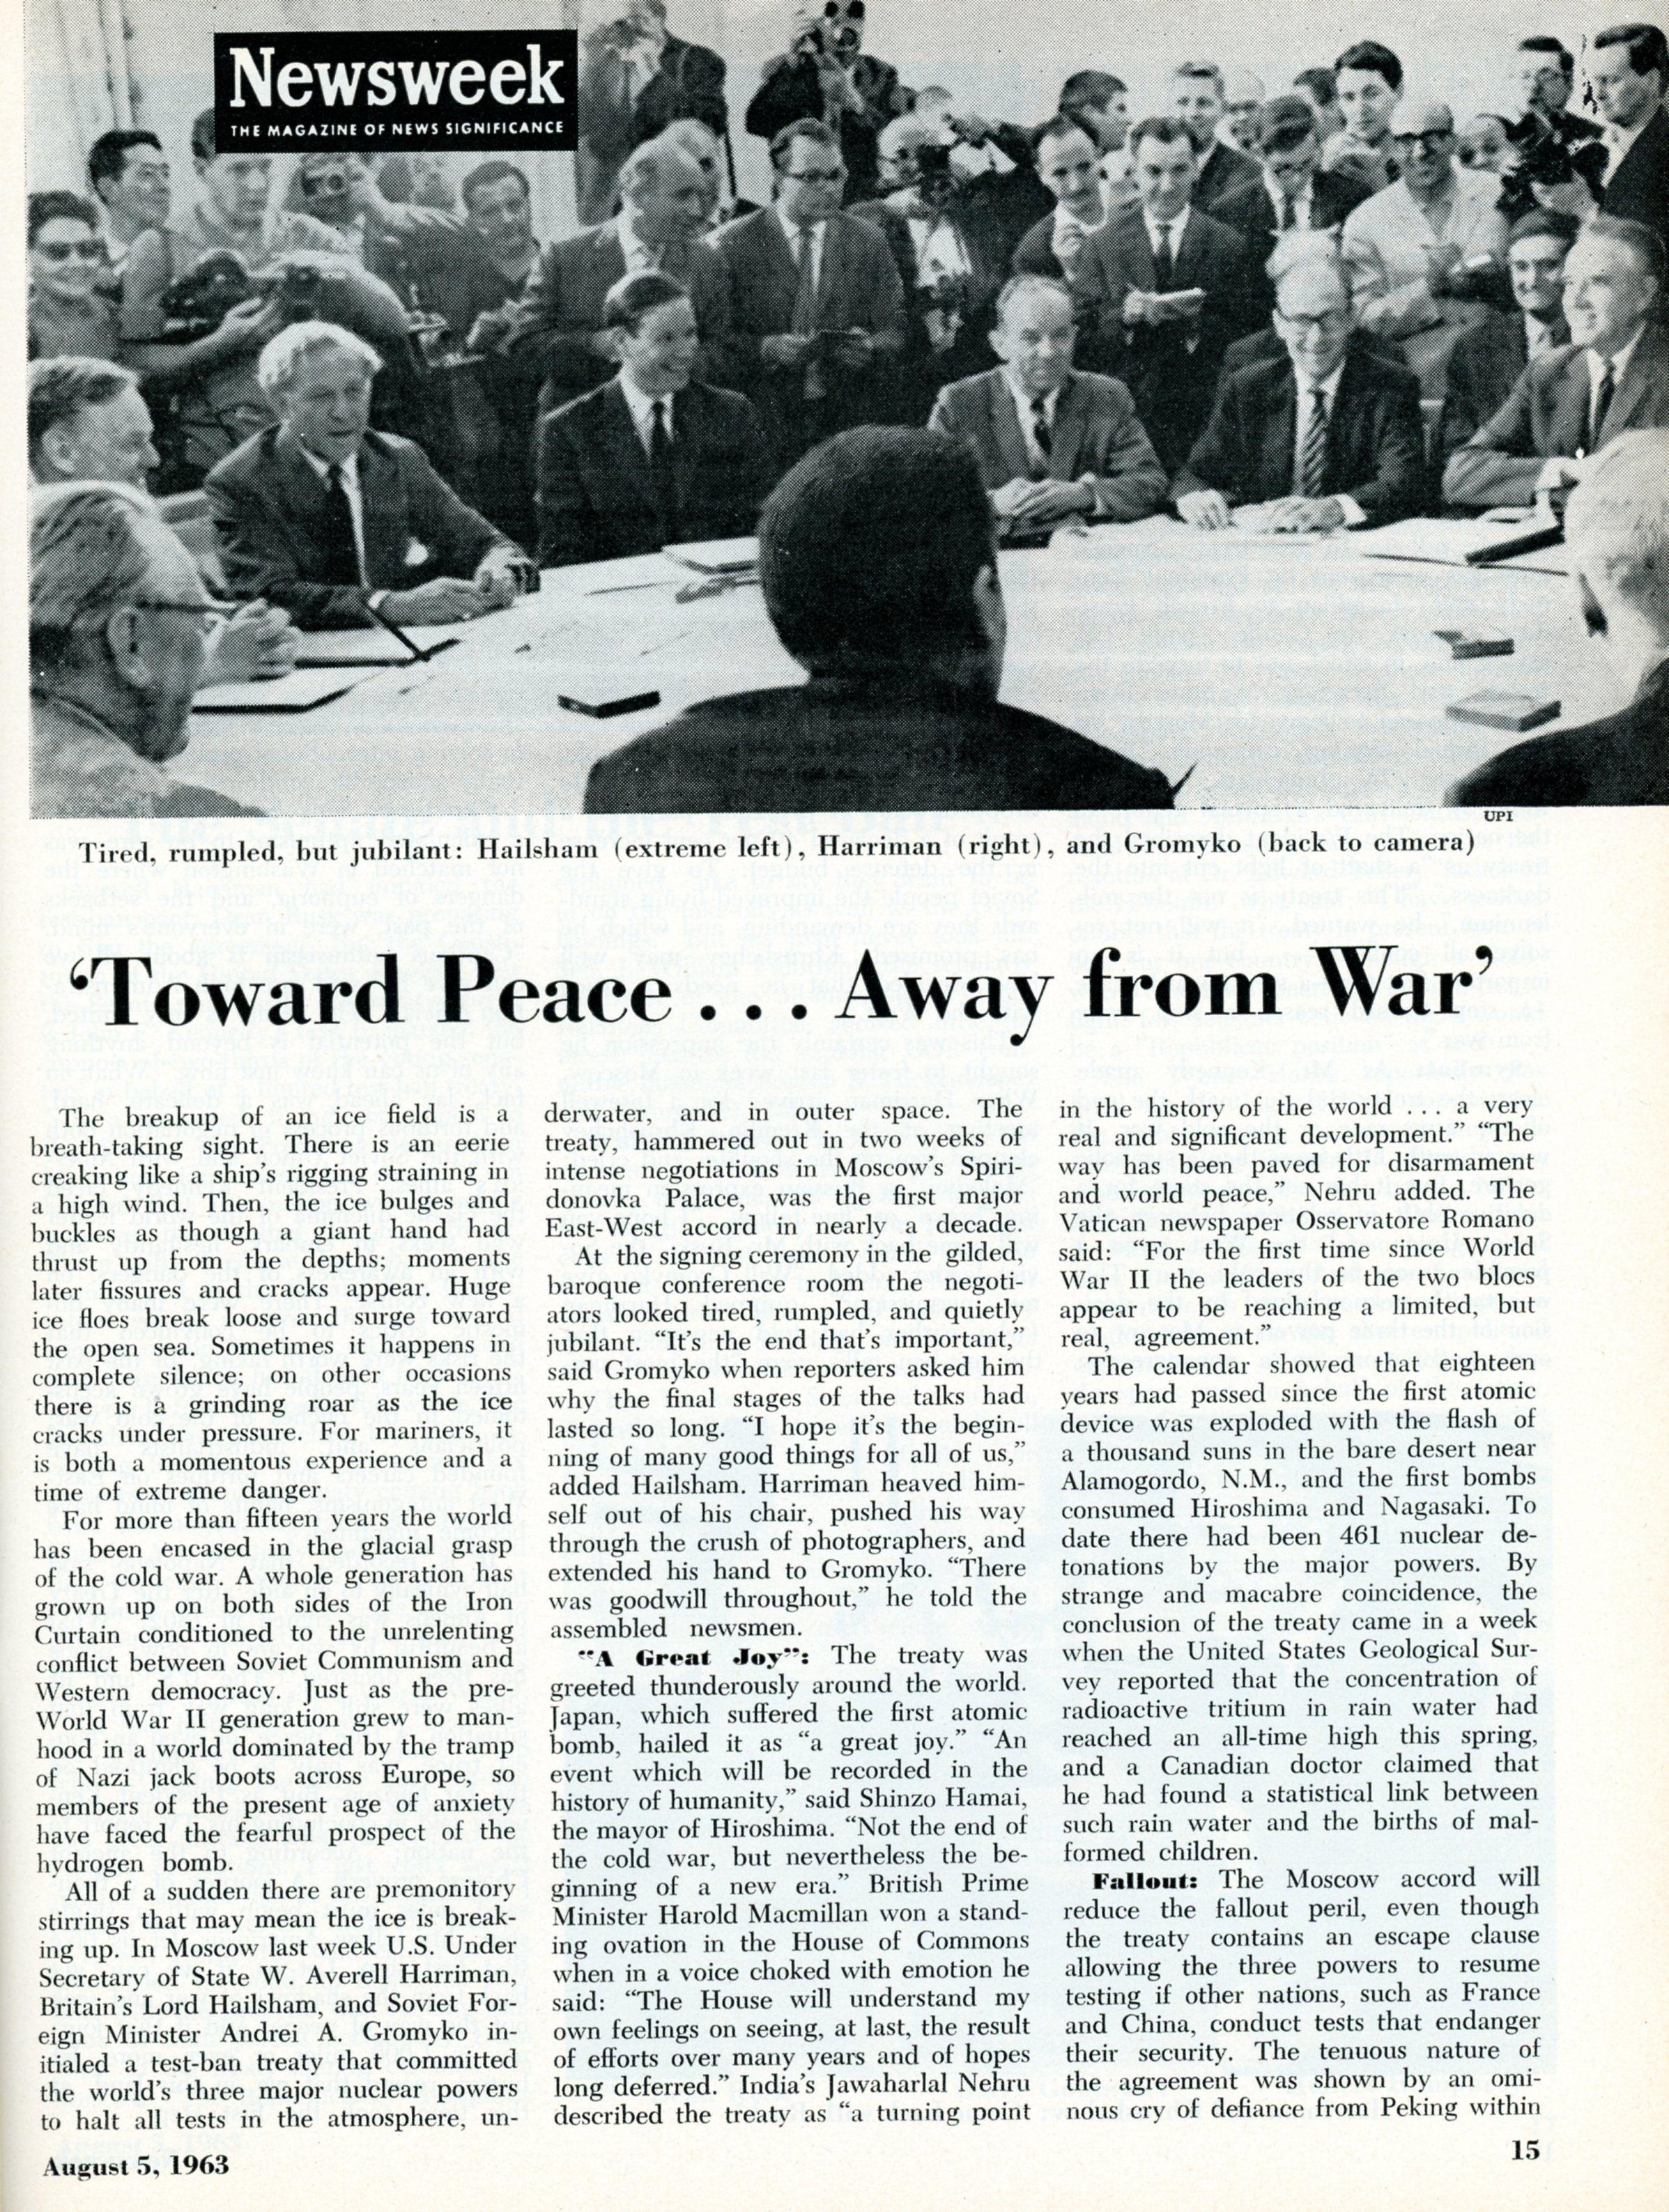 Aug 5 1963 pg 15